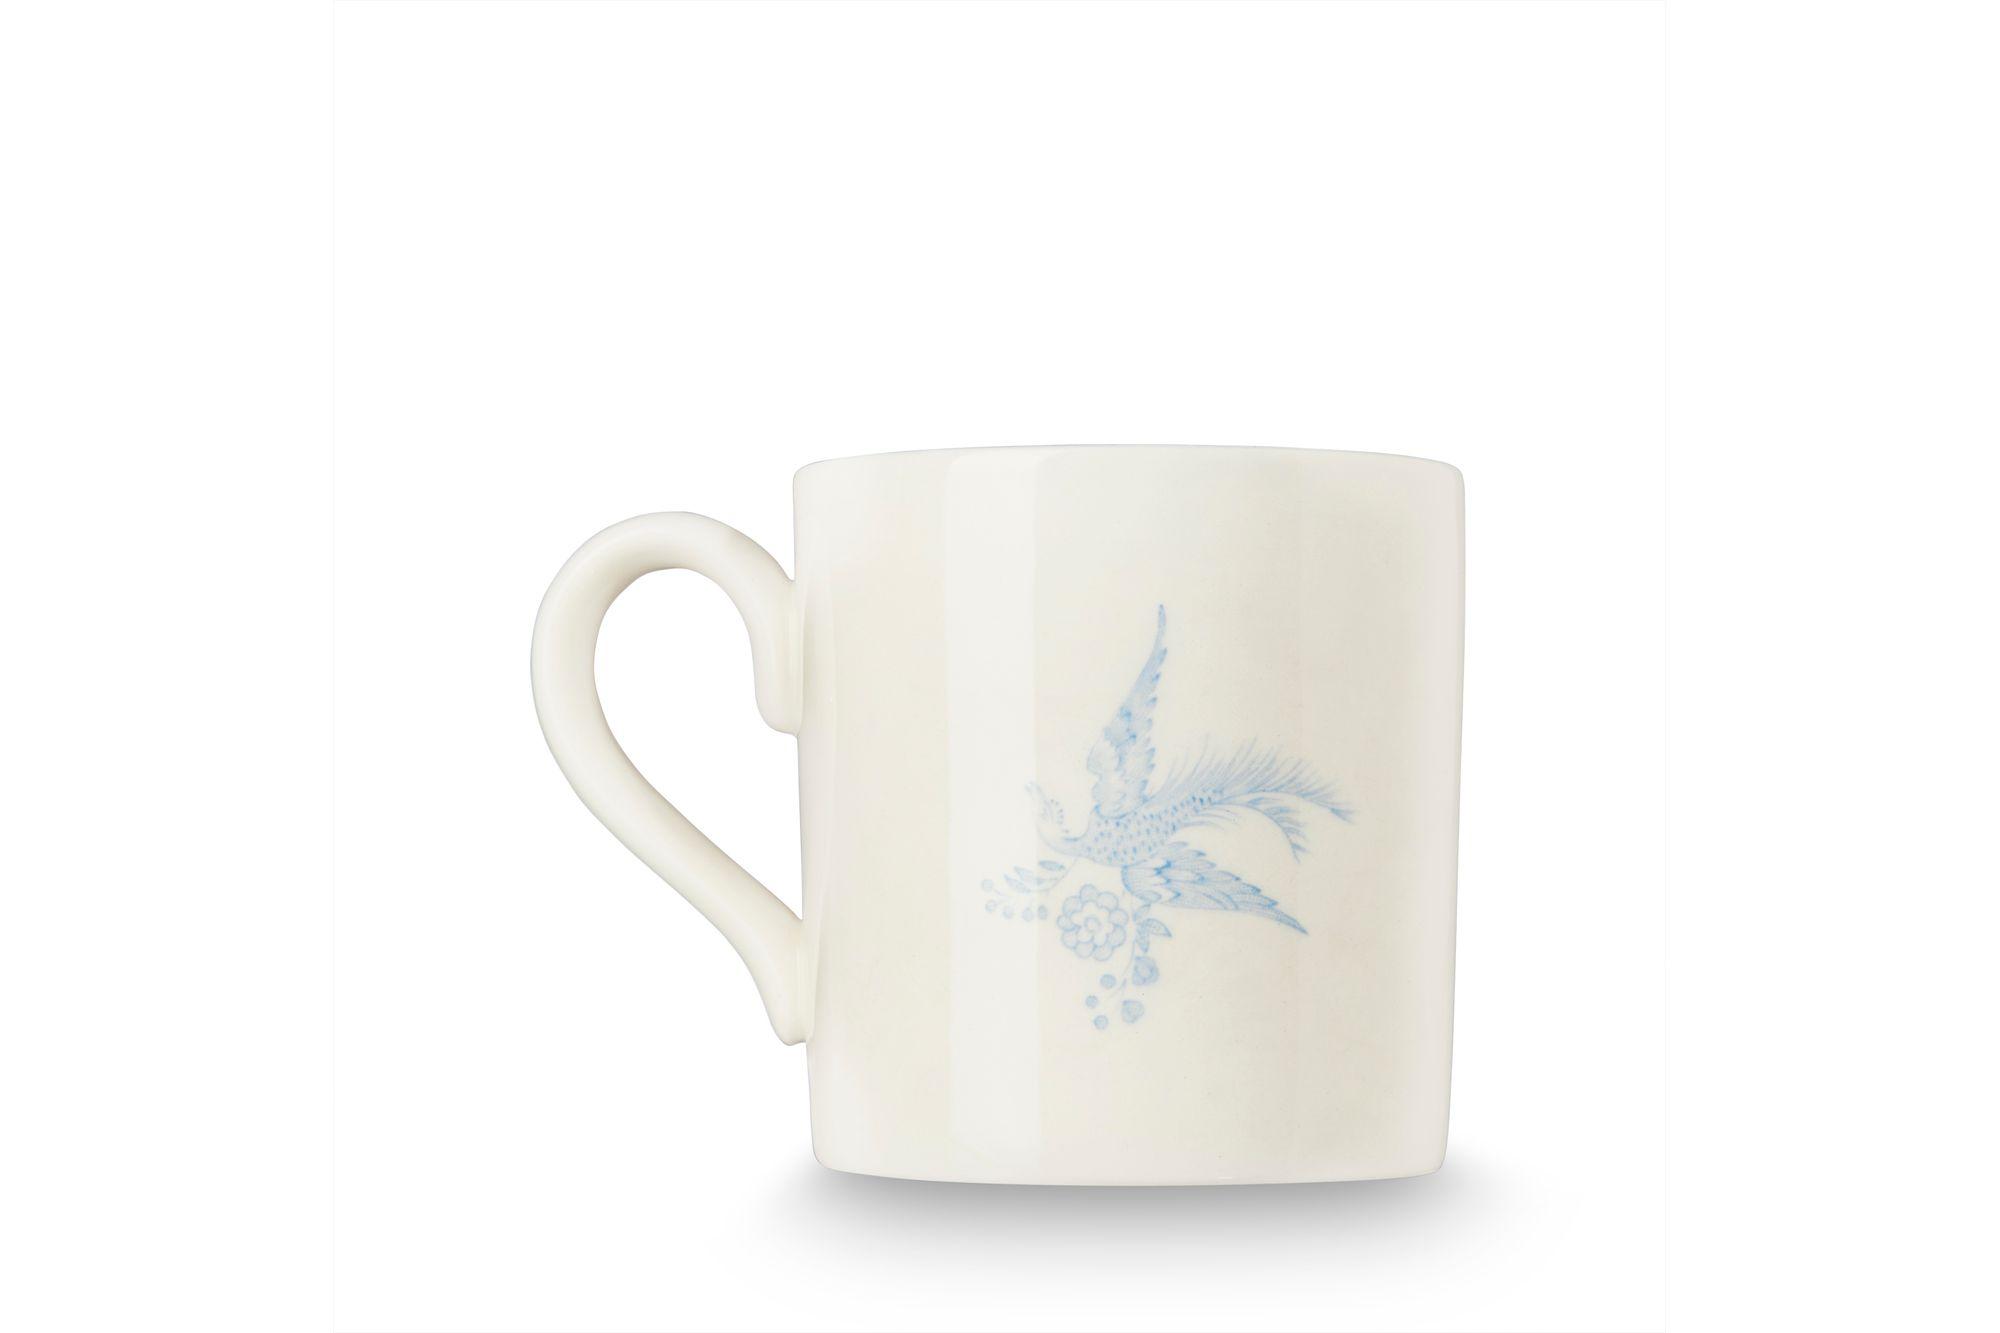 "Burleigh Blue Asiatic Pheasants Mug 3 1/2 x 3 1/2"" thumb 3"